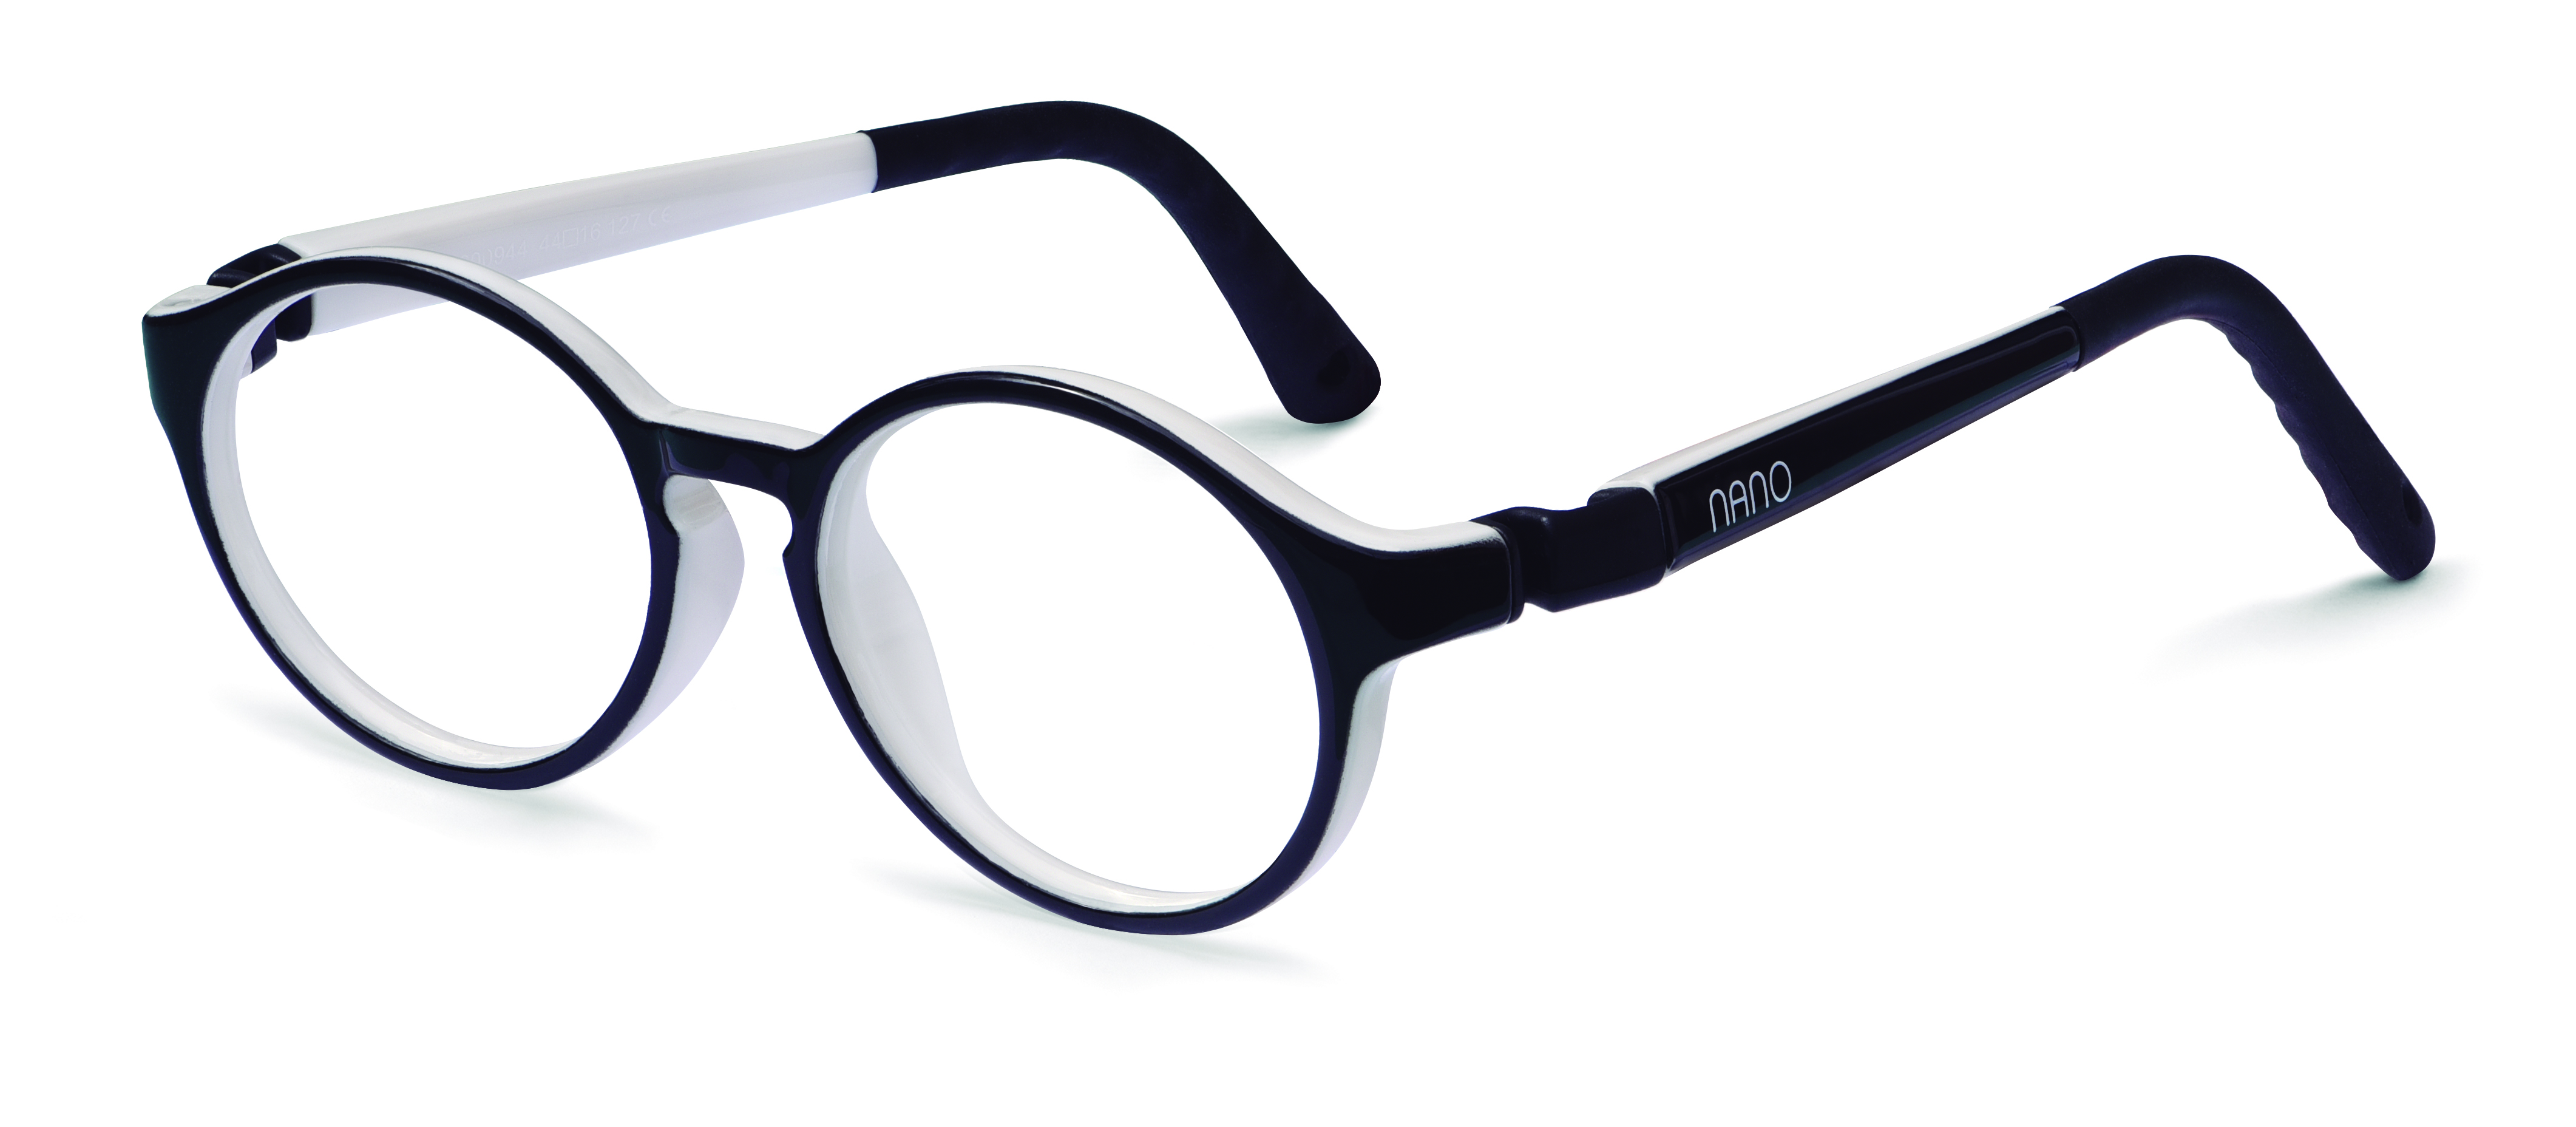 6b34111a6d Eyewear for Kids - White 11-13 years - Optiwow